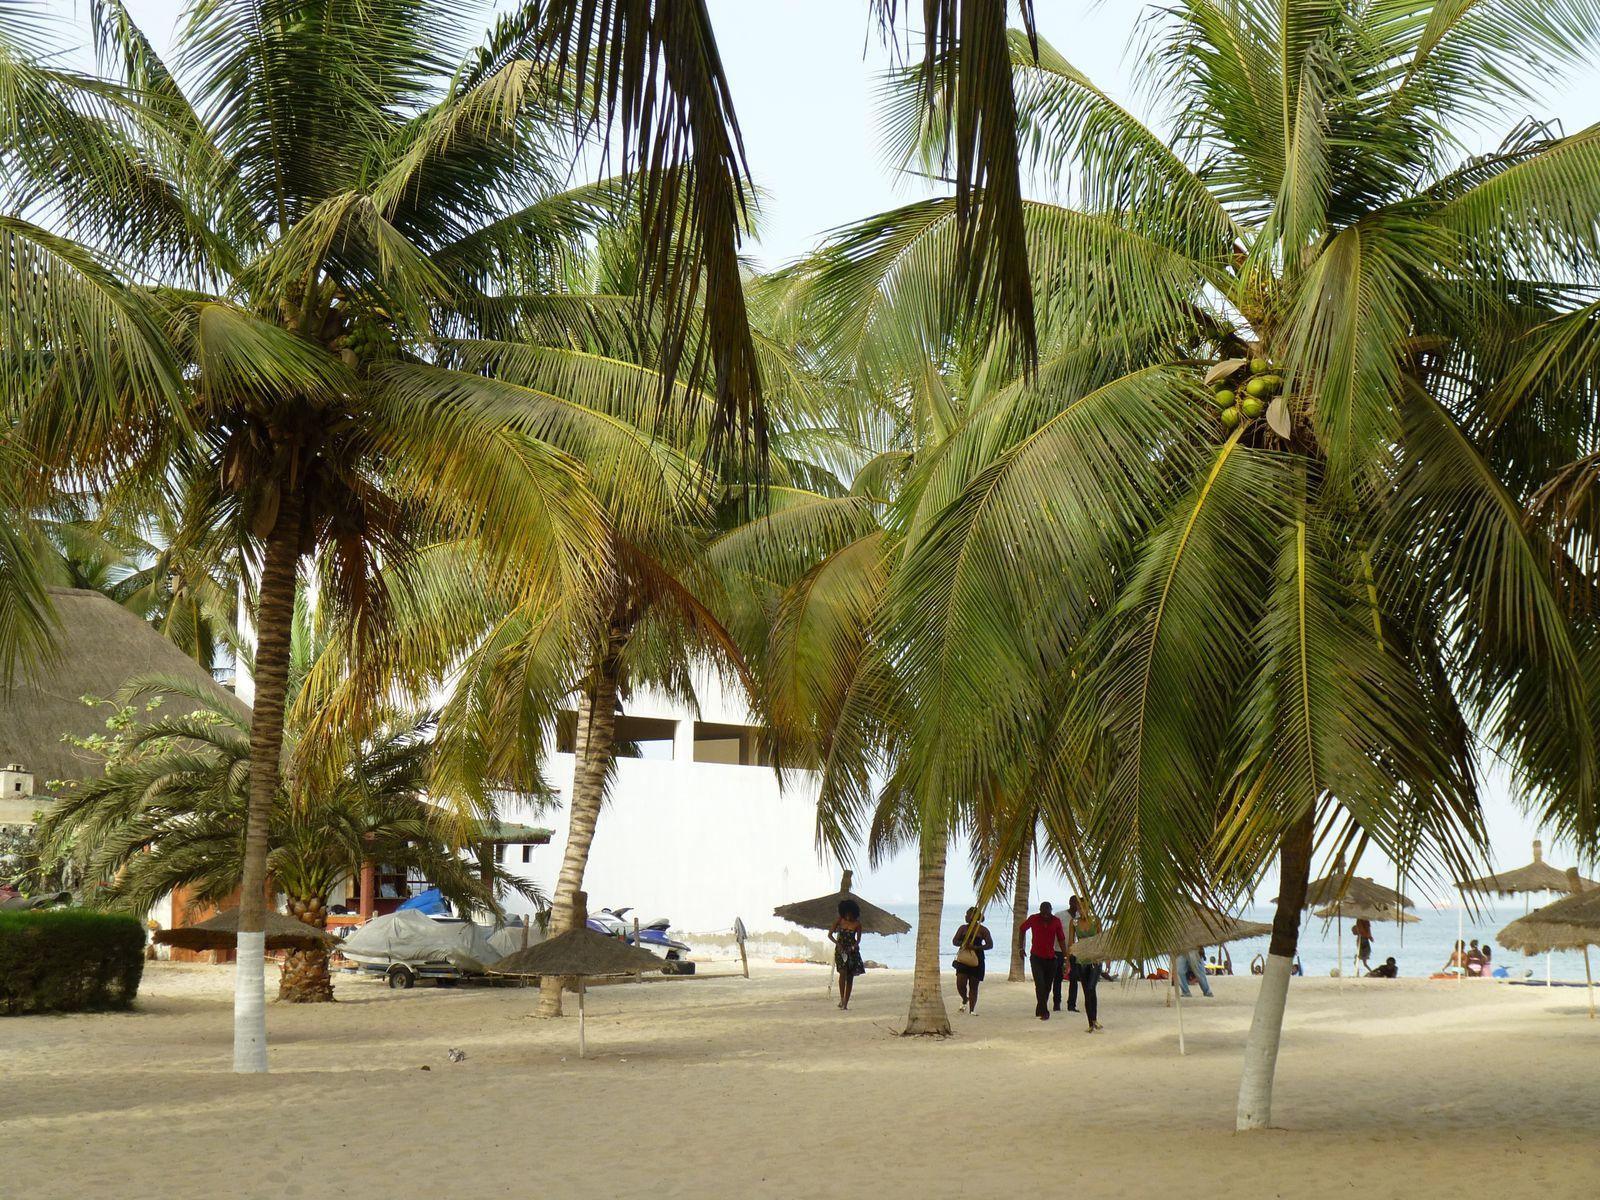 plages payantes